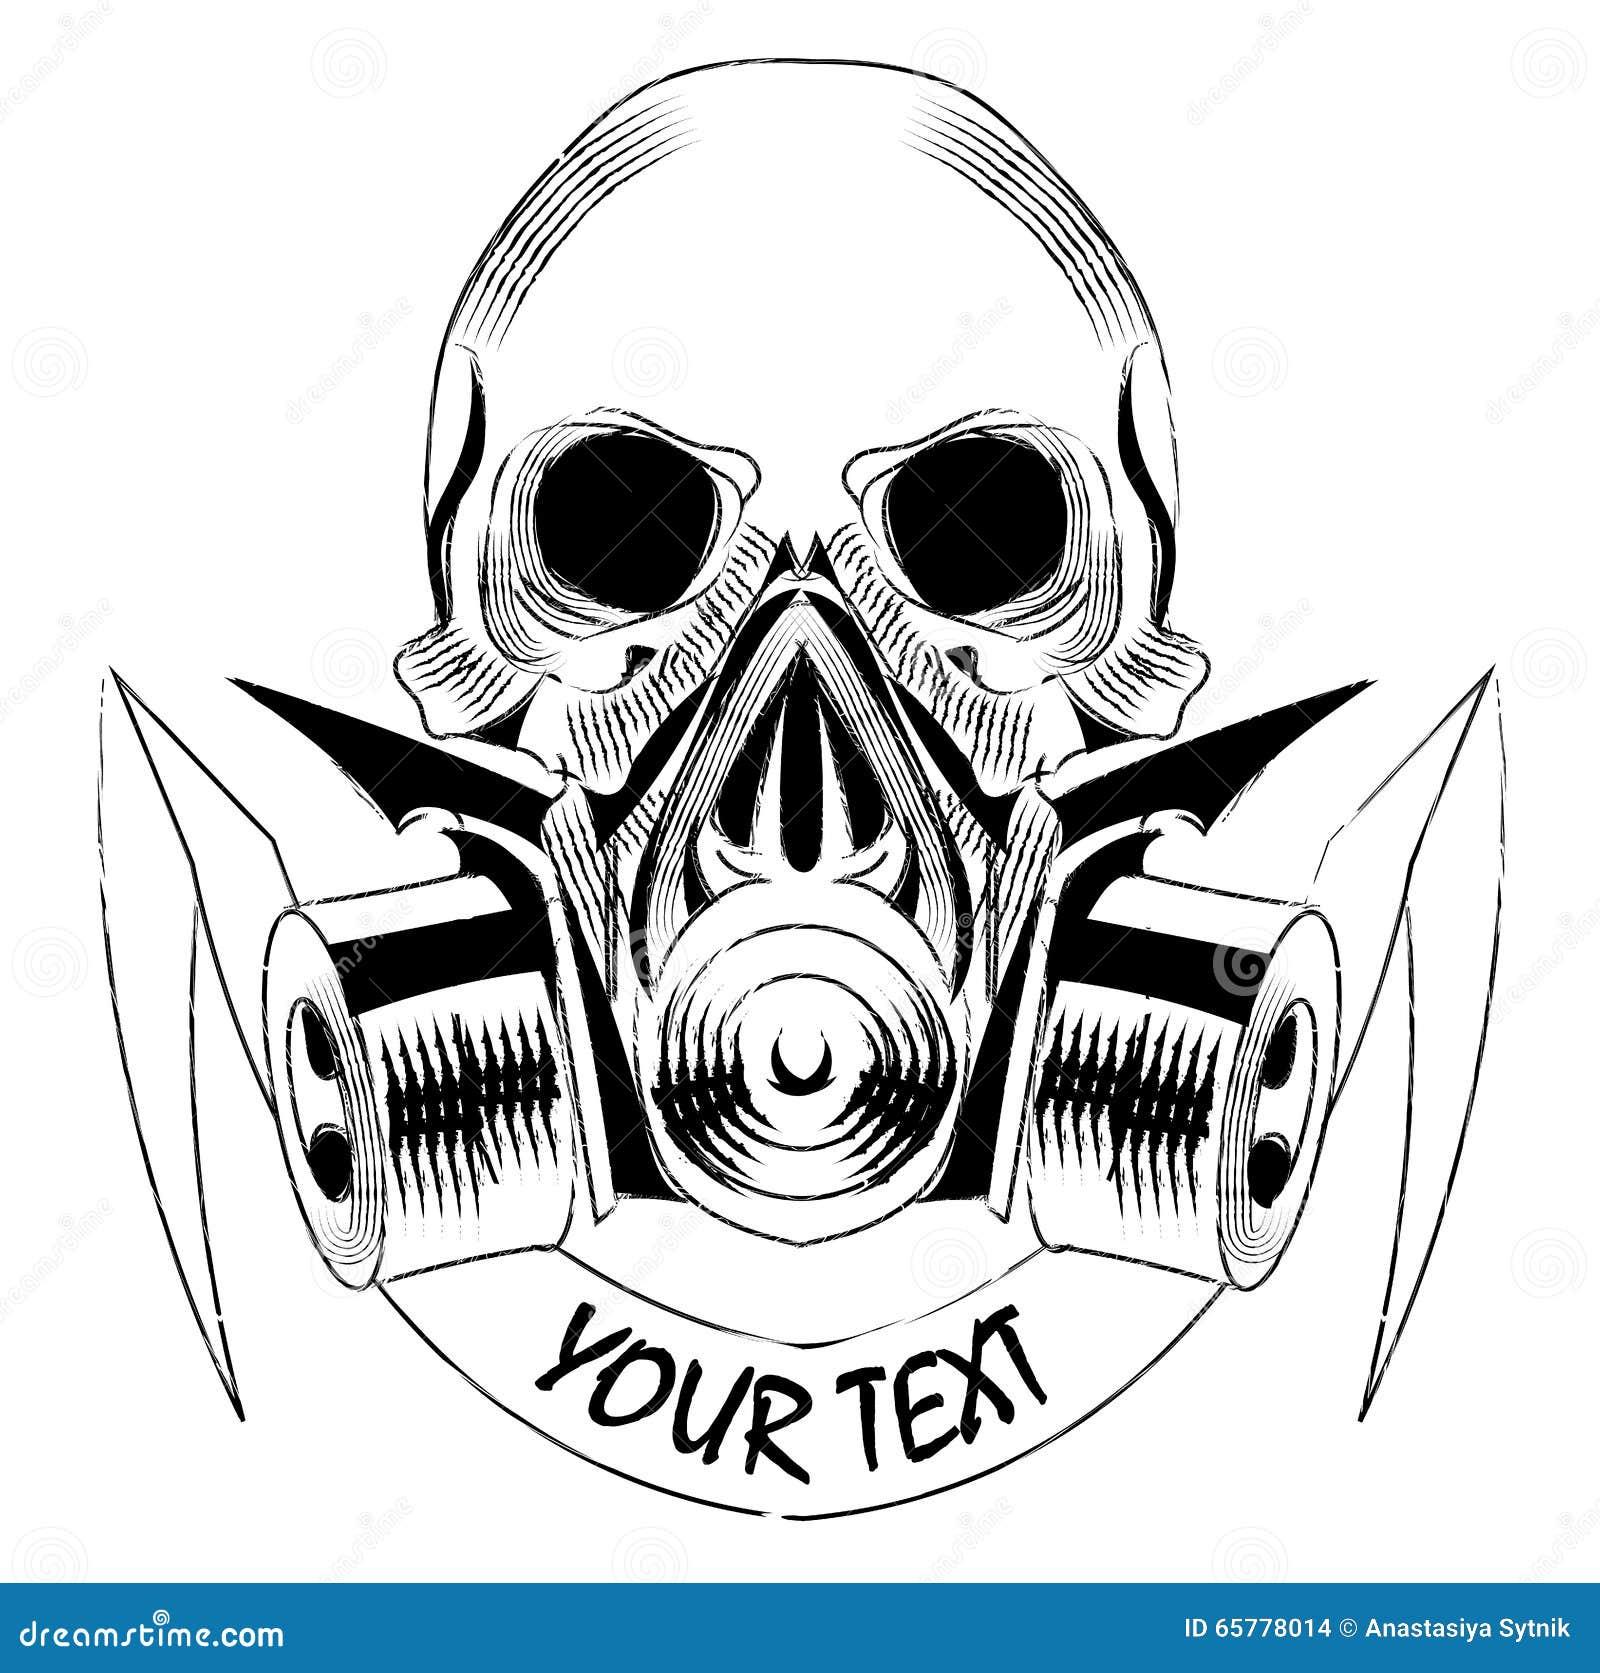 gas mask and skull royaltyfree stock image